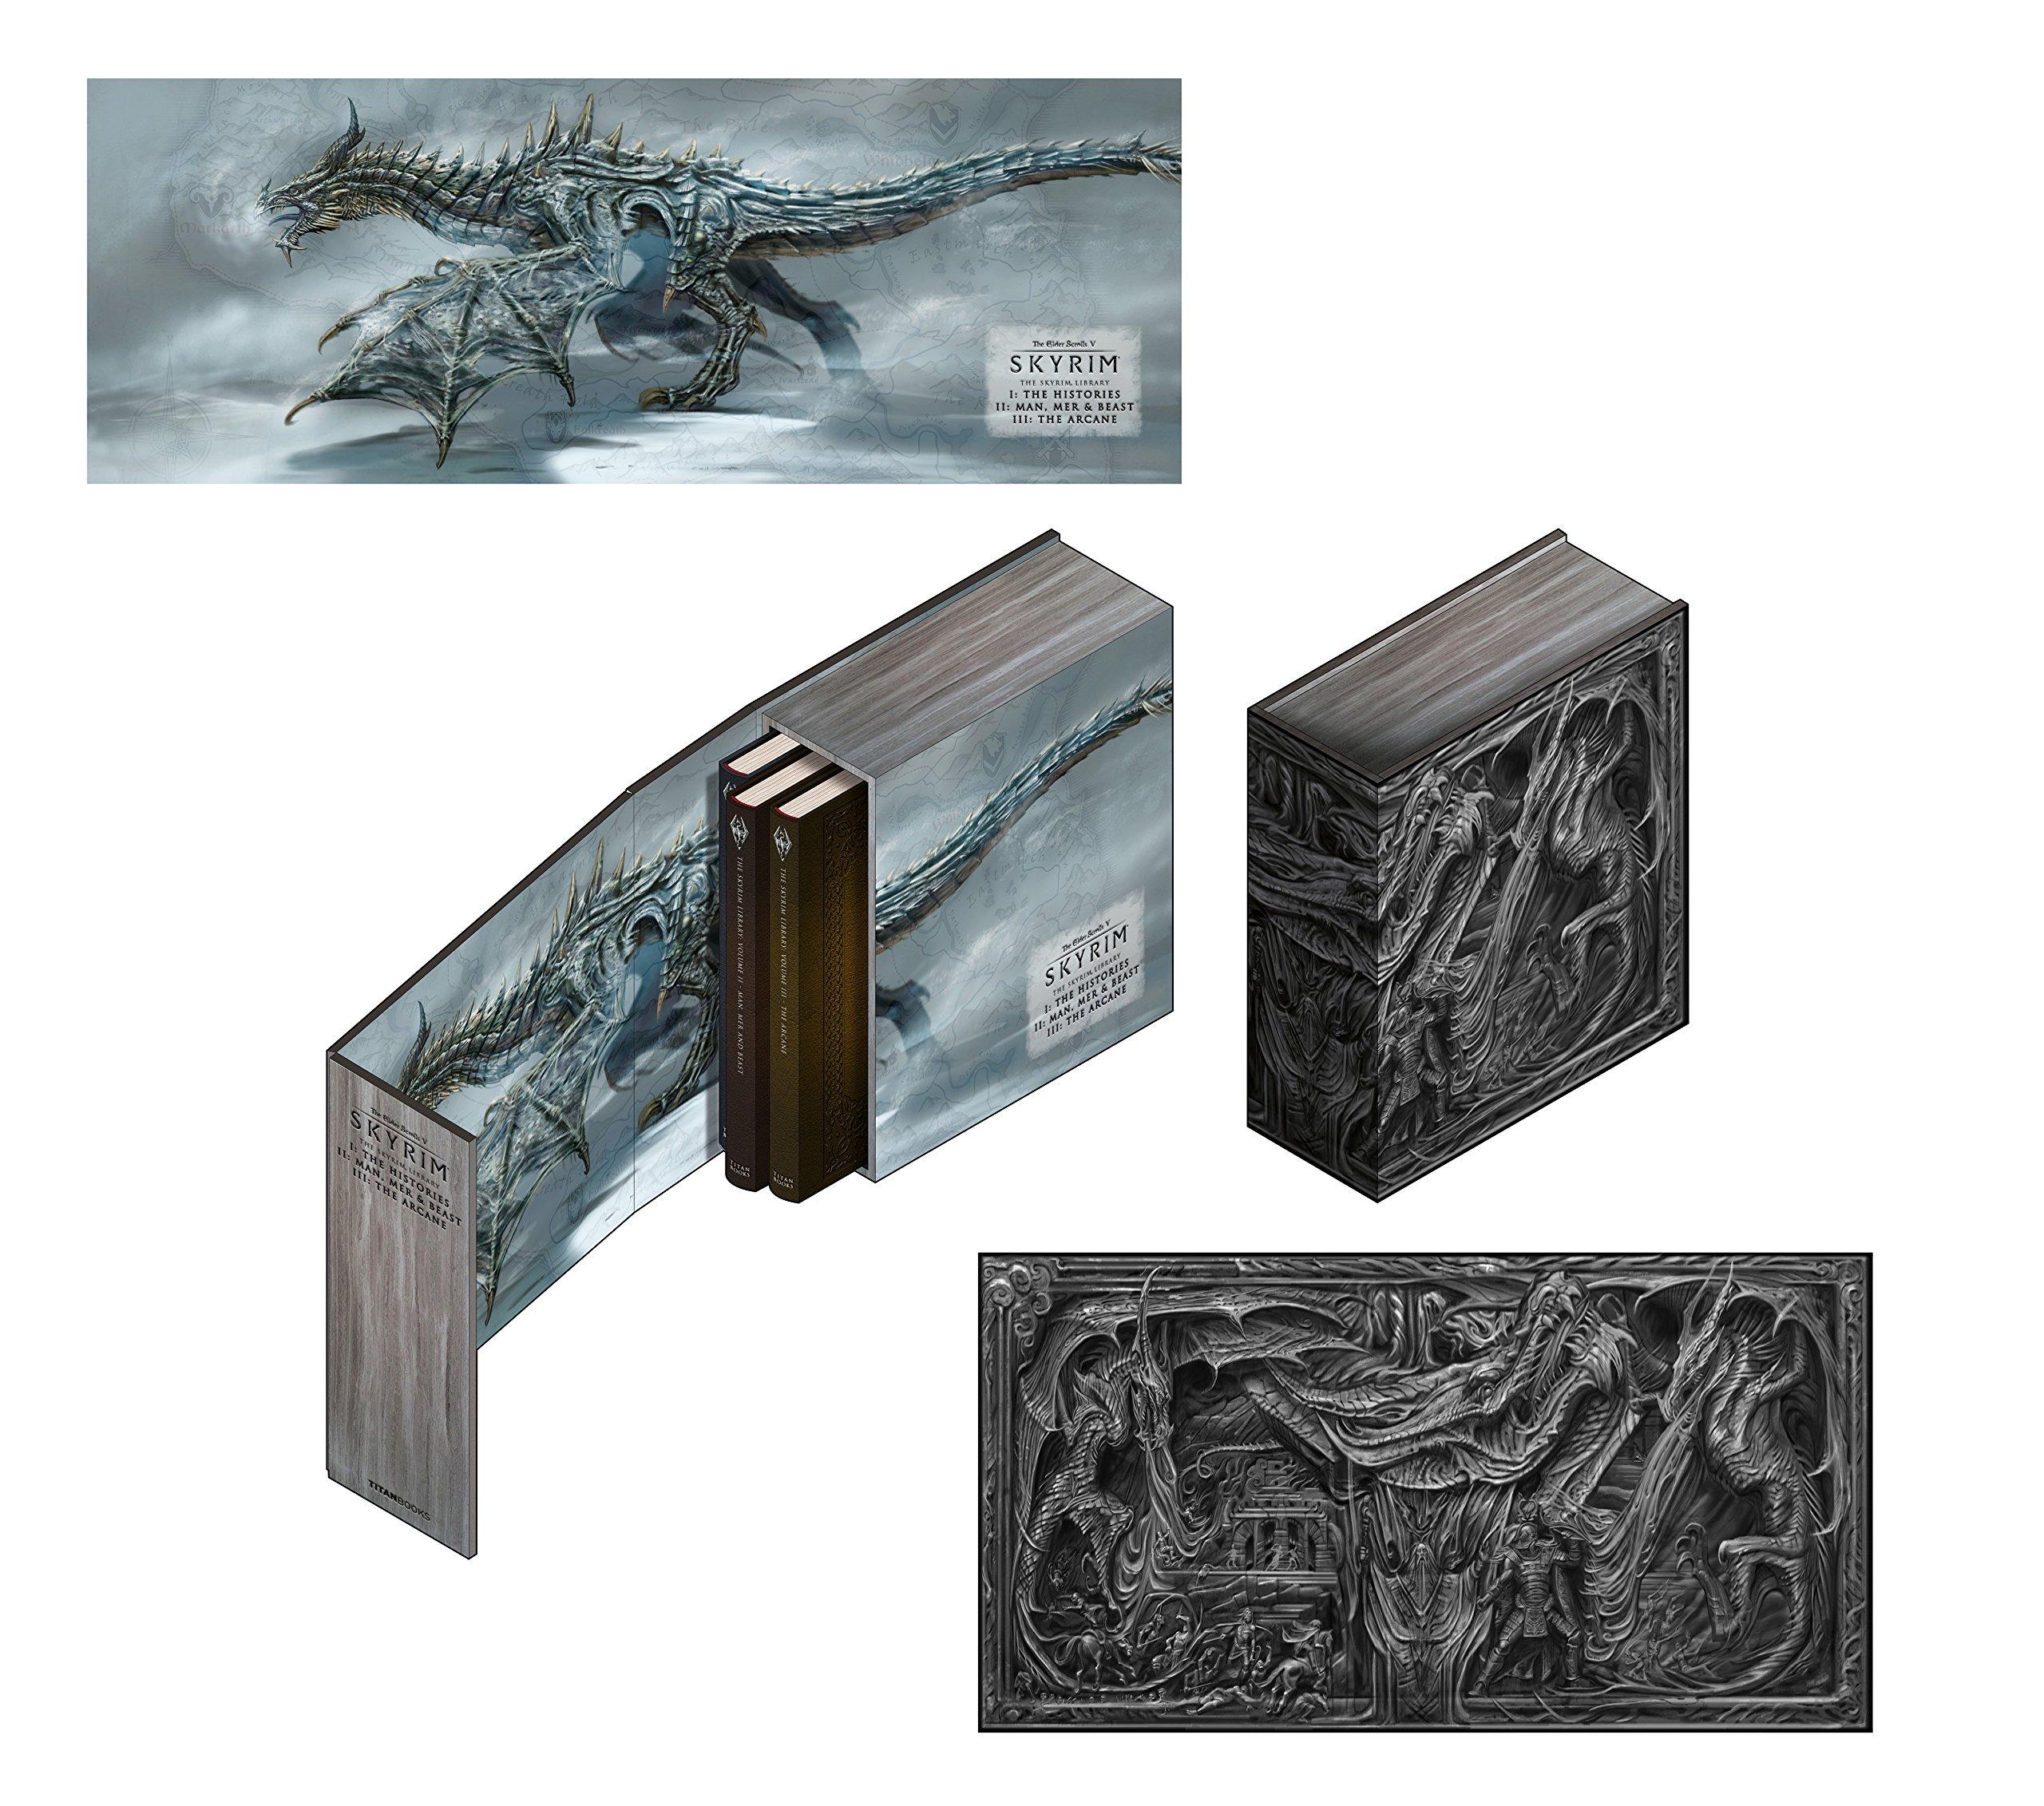 The Skyrim Library: Volumes I, II & III Box Set (Hardcover Books) $41.24 AC + Free Shipping via Amazon